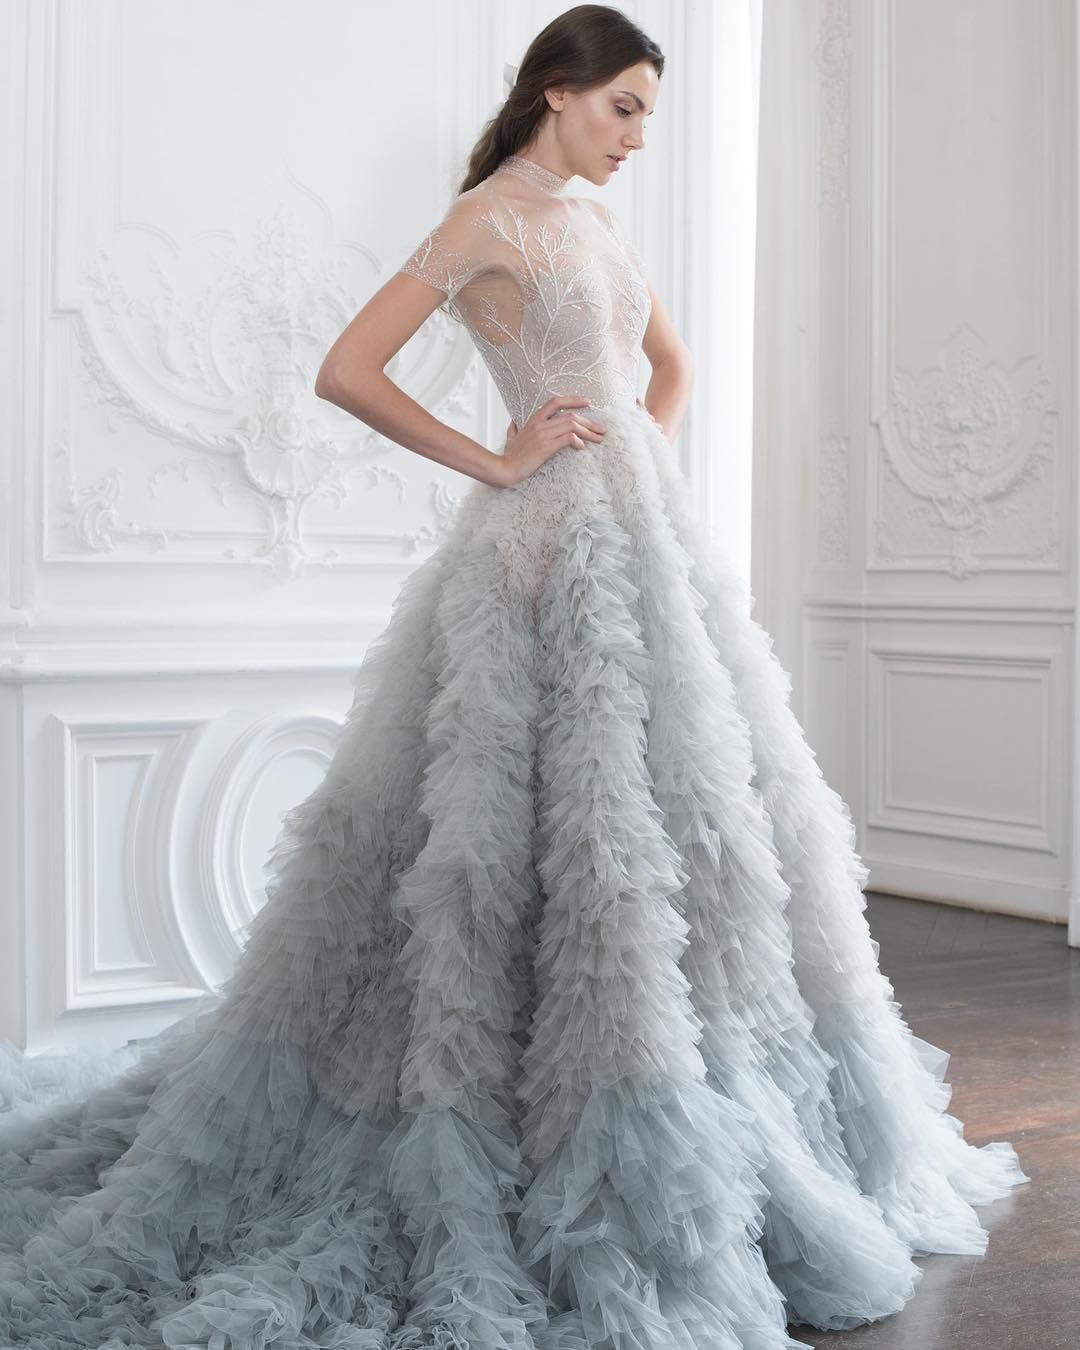 Dusty blue ombre wedding dress psaw u ruffle ballgown with